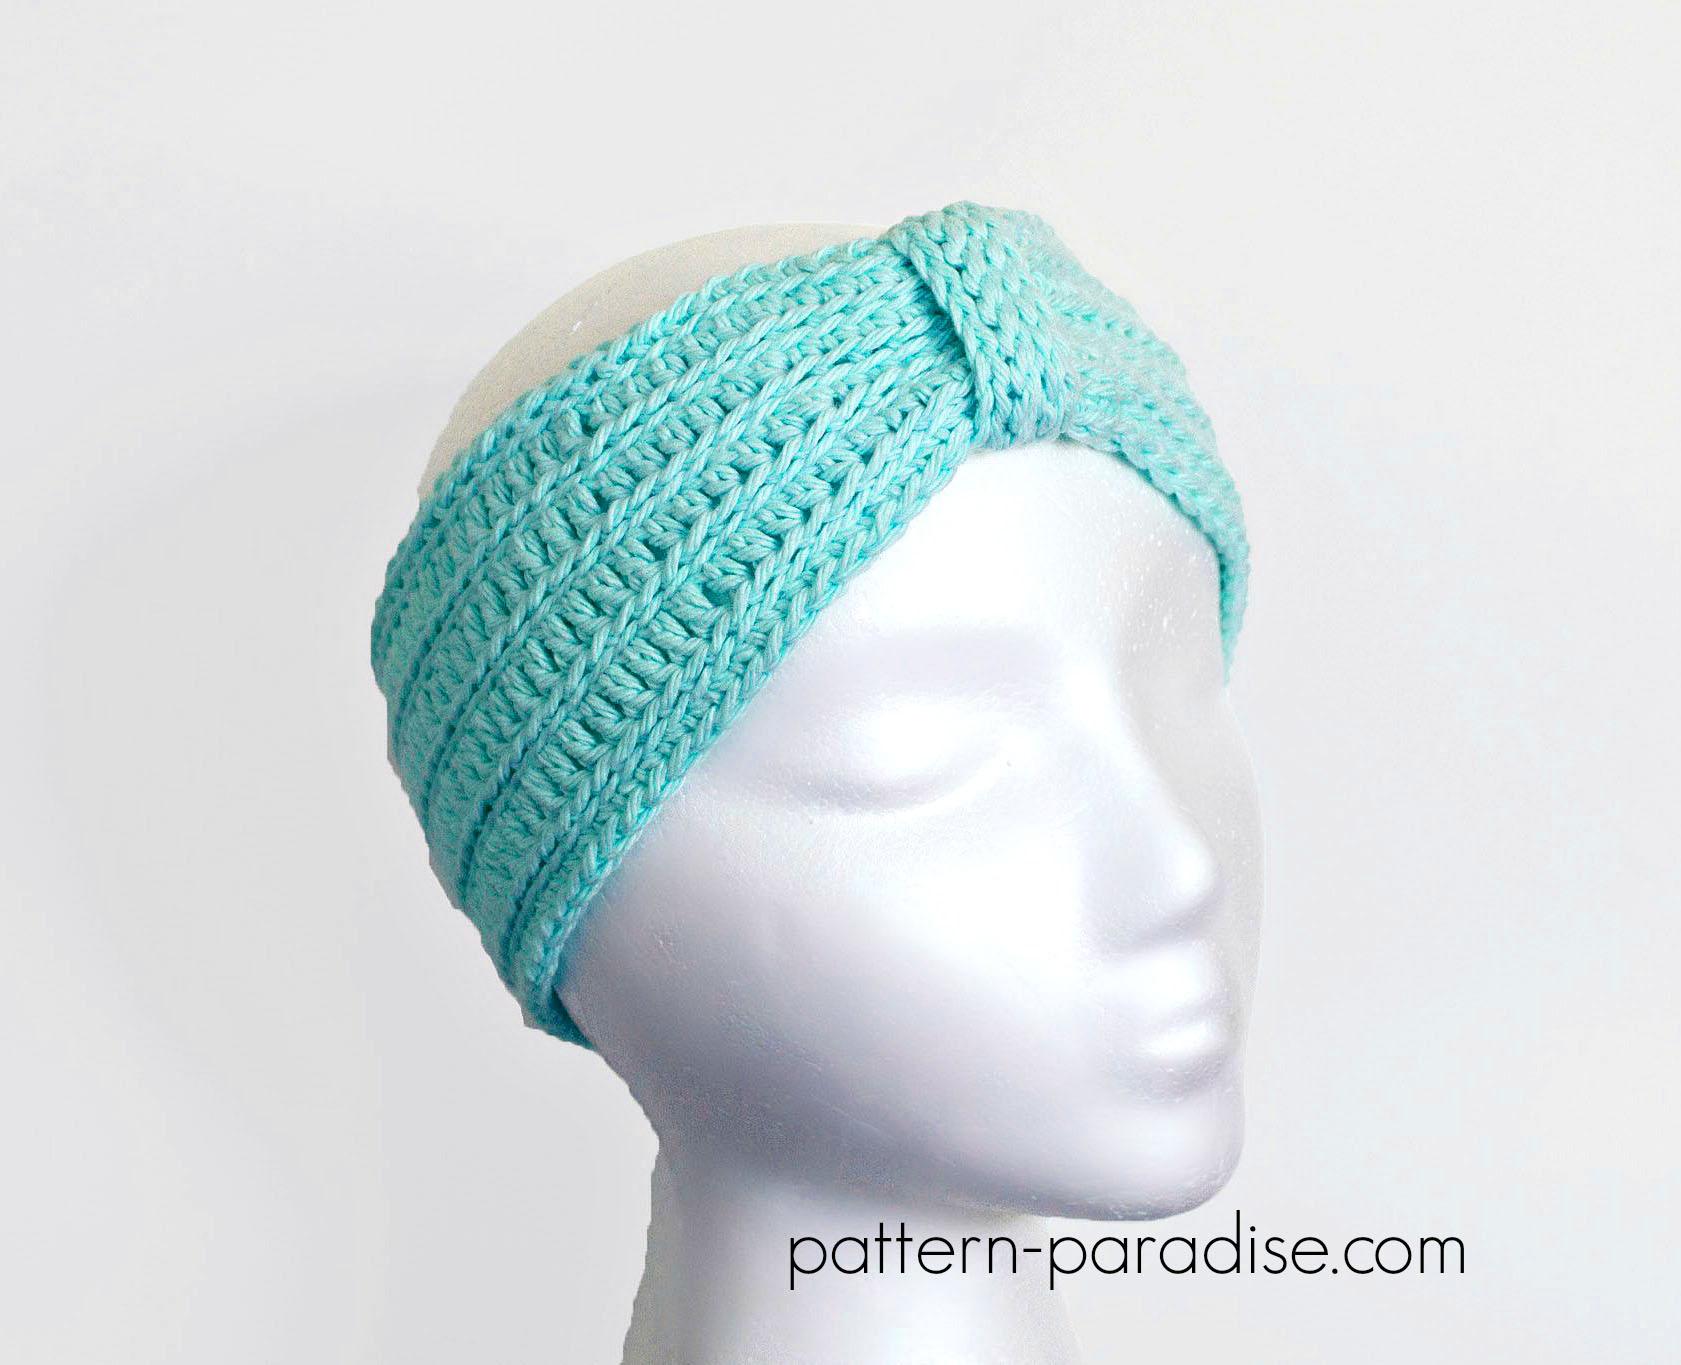 Free Crochet Pattern Tranquility Turban Headband